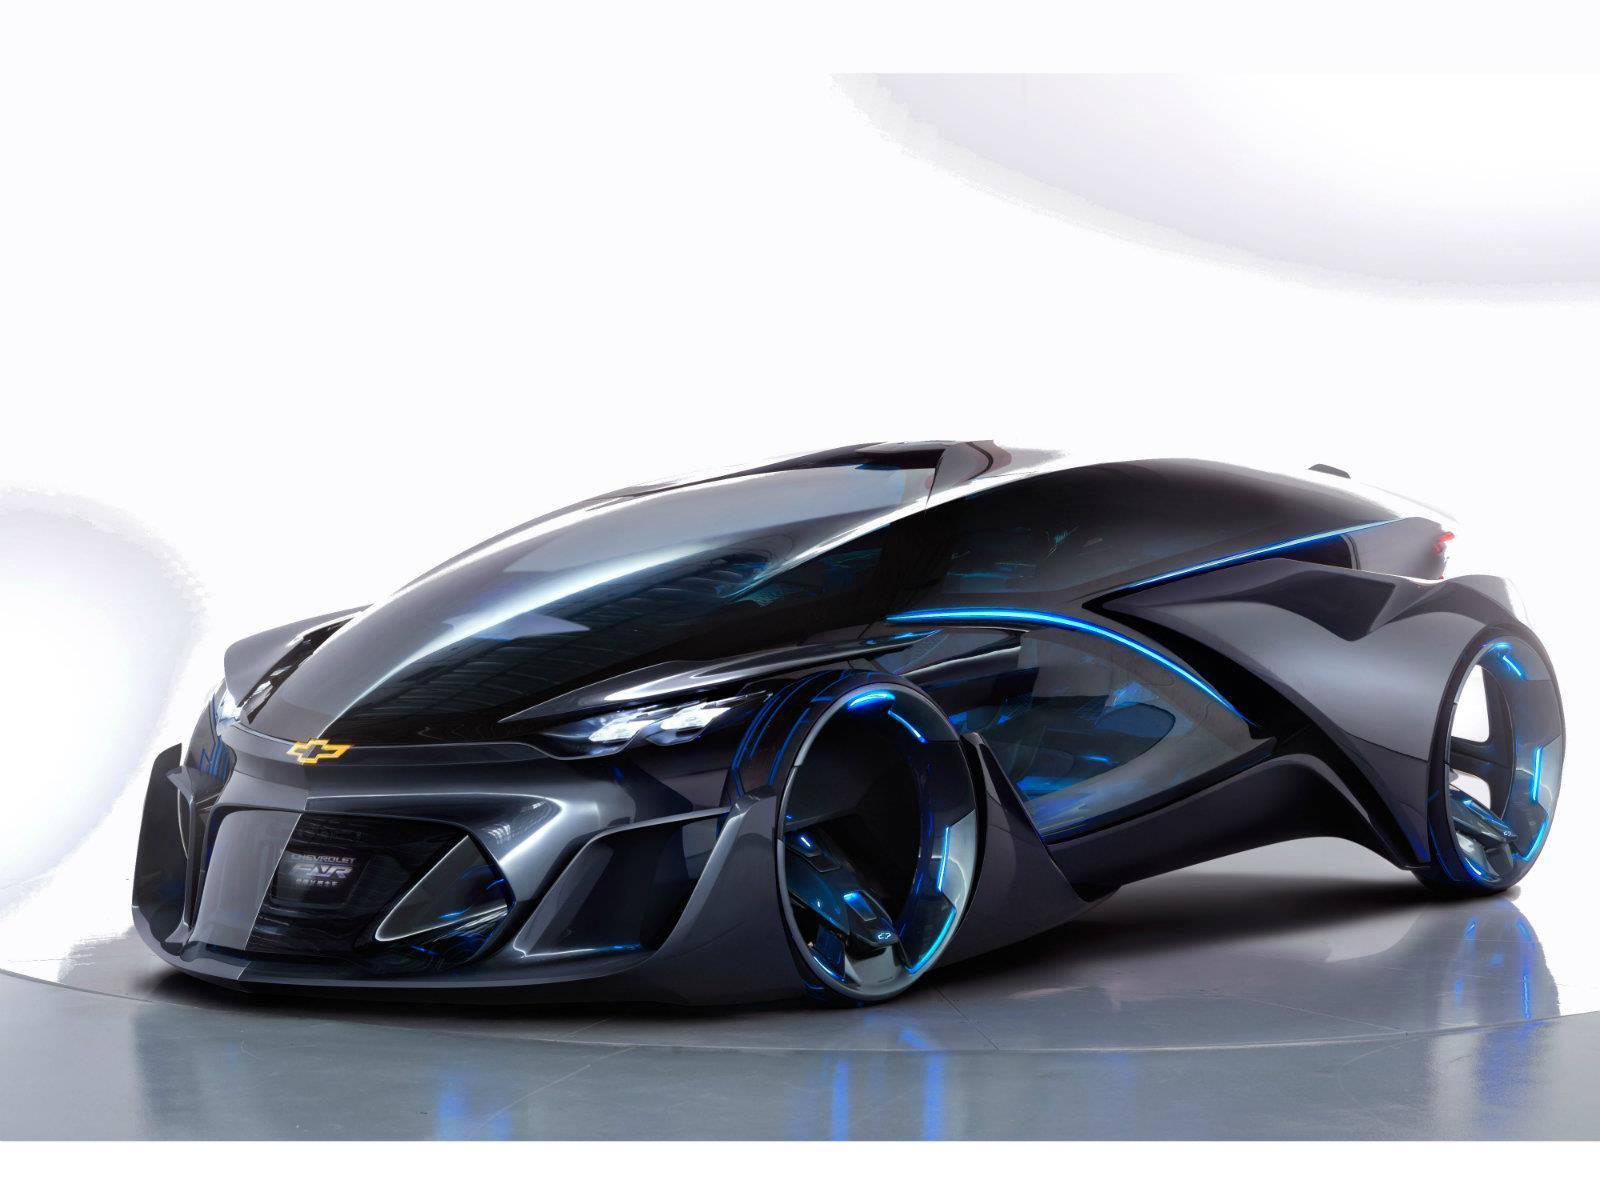 Autoshow De Shanghai 2015 Chevrolet Fnr Concept El Auto